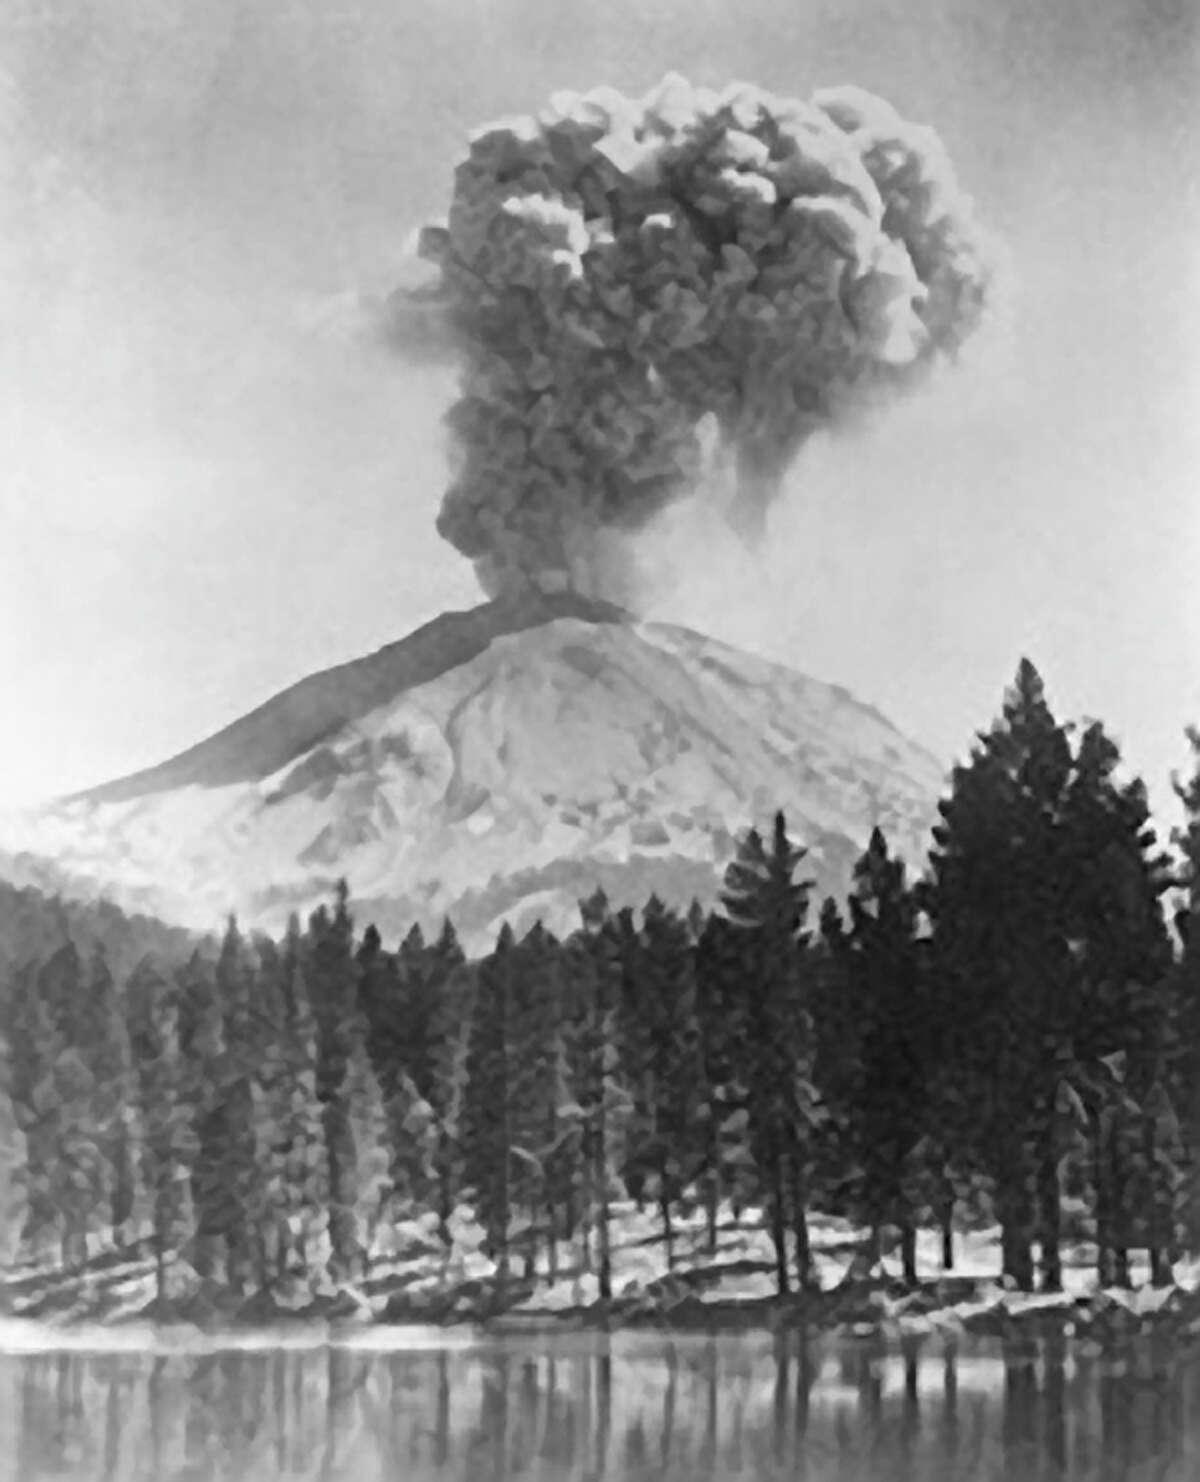 Mount Lassen erupted in 1915, showering ash for 200 miles.